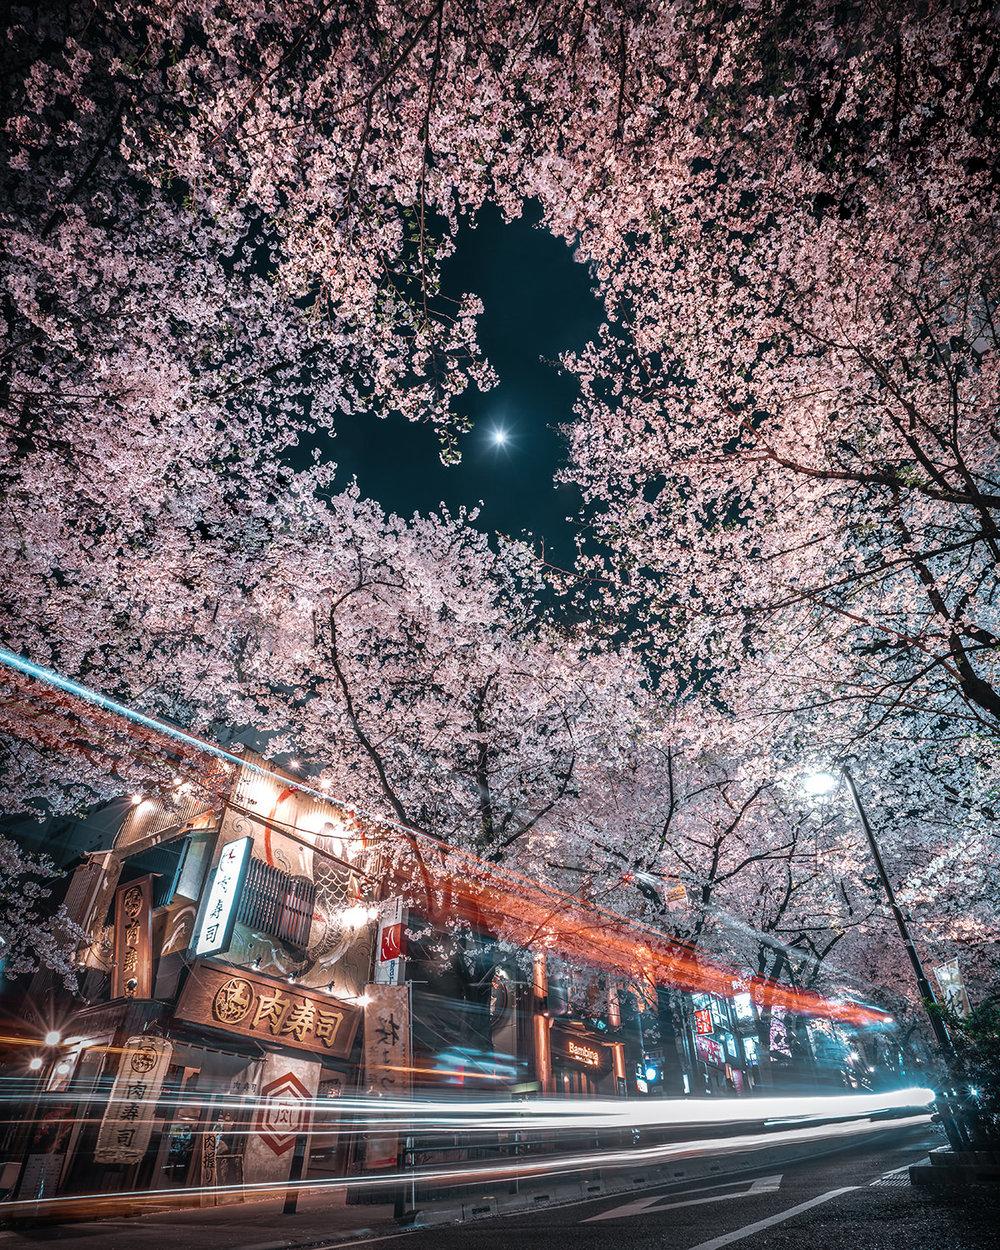 RK-street-foto-giappone-05jpg.jpg